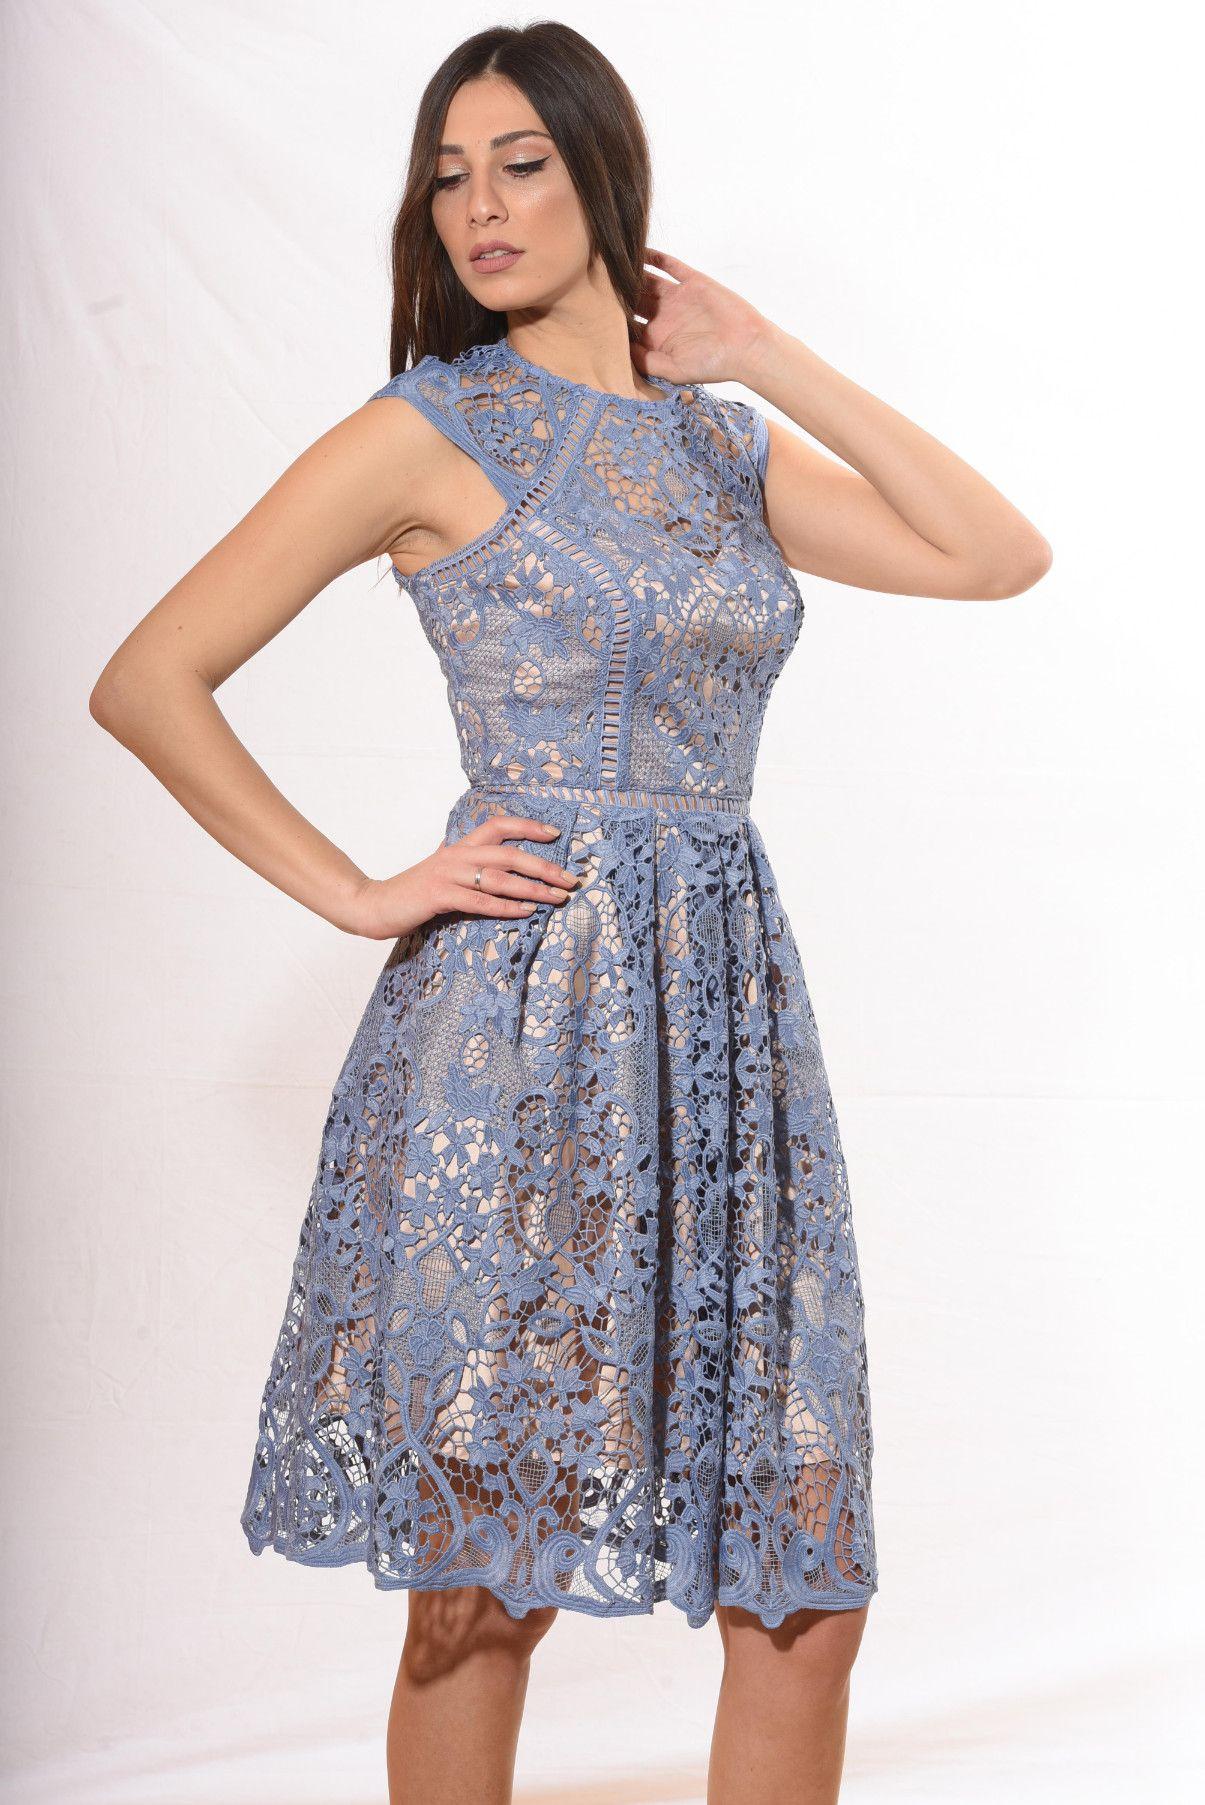 c65da3d4cc54 Φόρεμα κοκτέιλ κάτω από το γόνατο με αέρινη φούστα